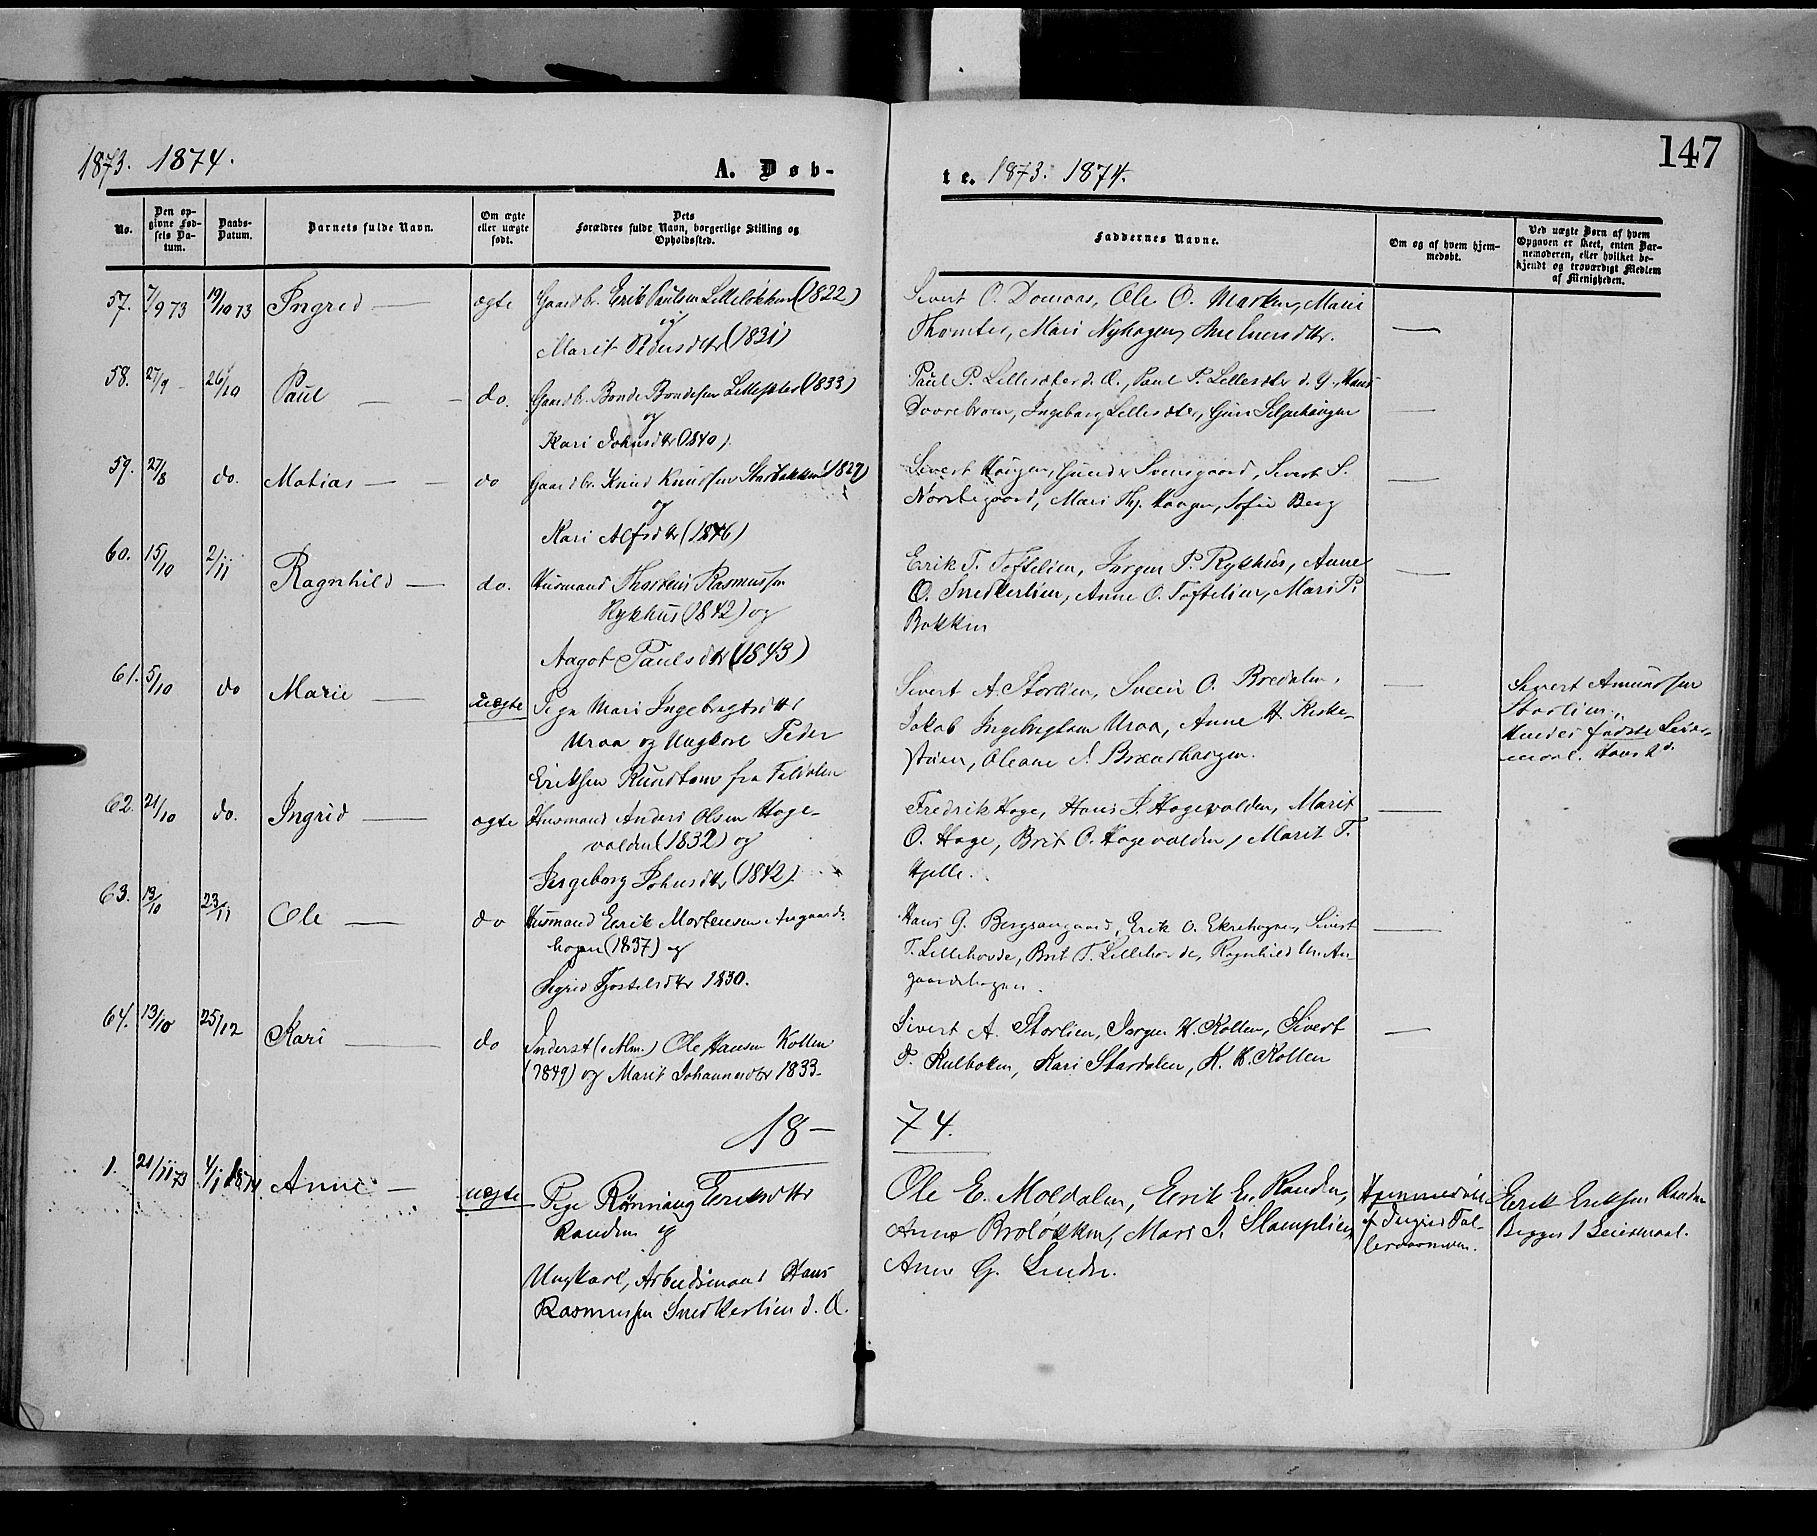 SAH, Dovre prestekontor, Ministerialbok nr. 1, 1854-1878, s. 147